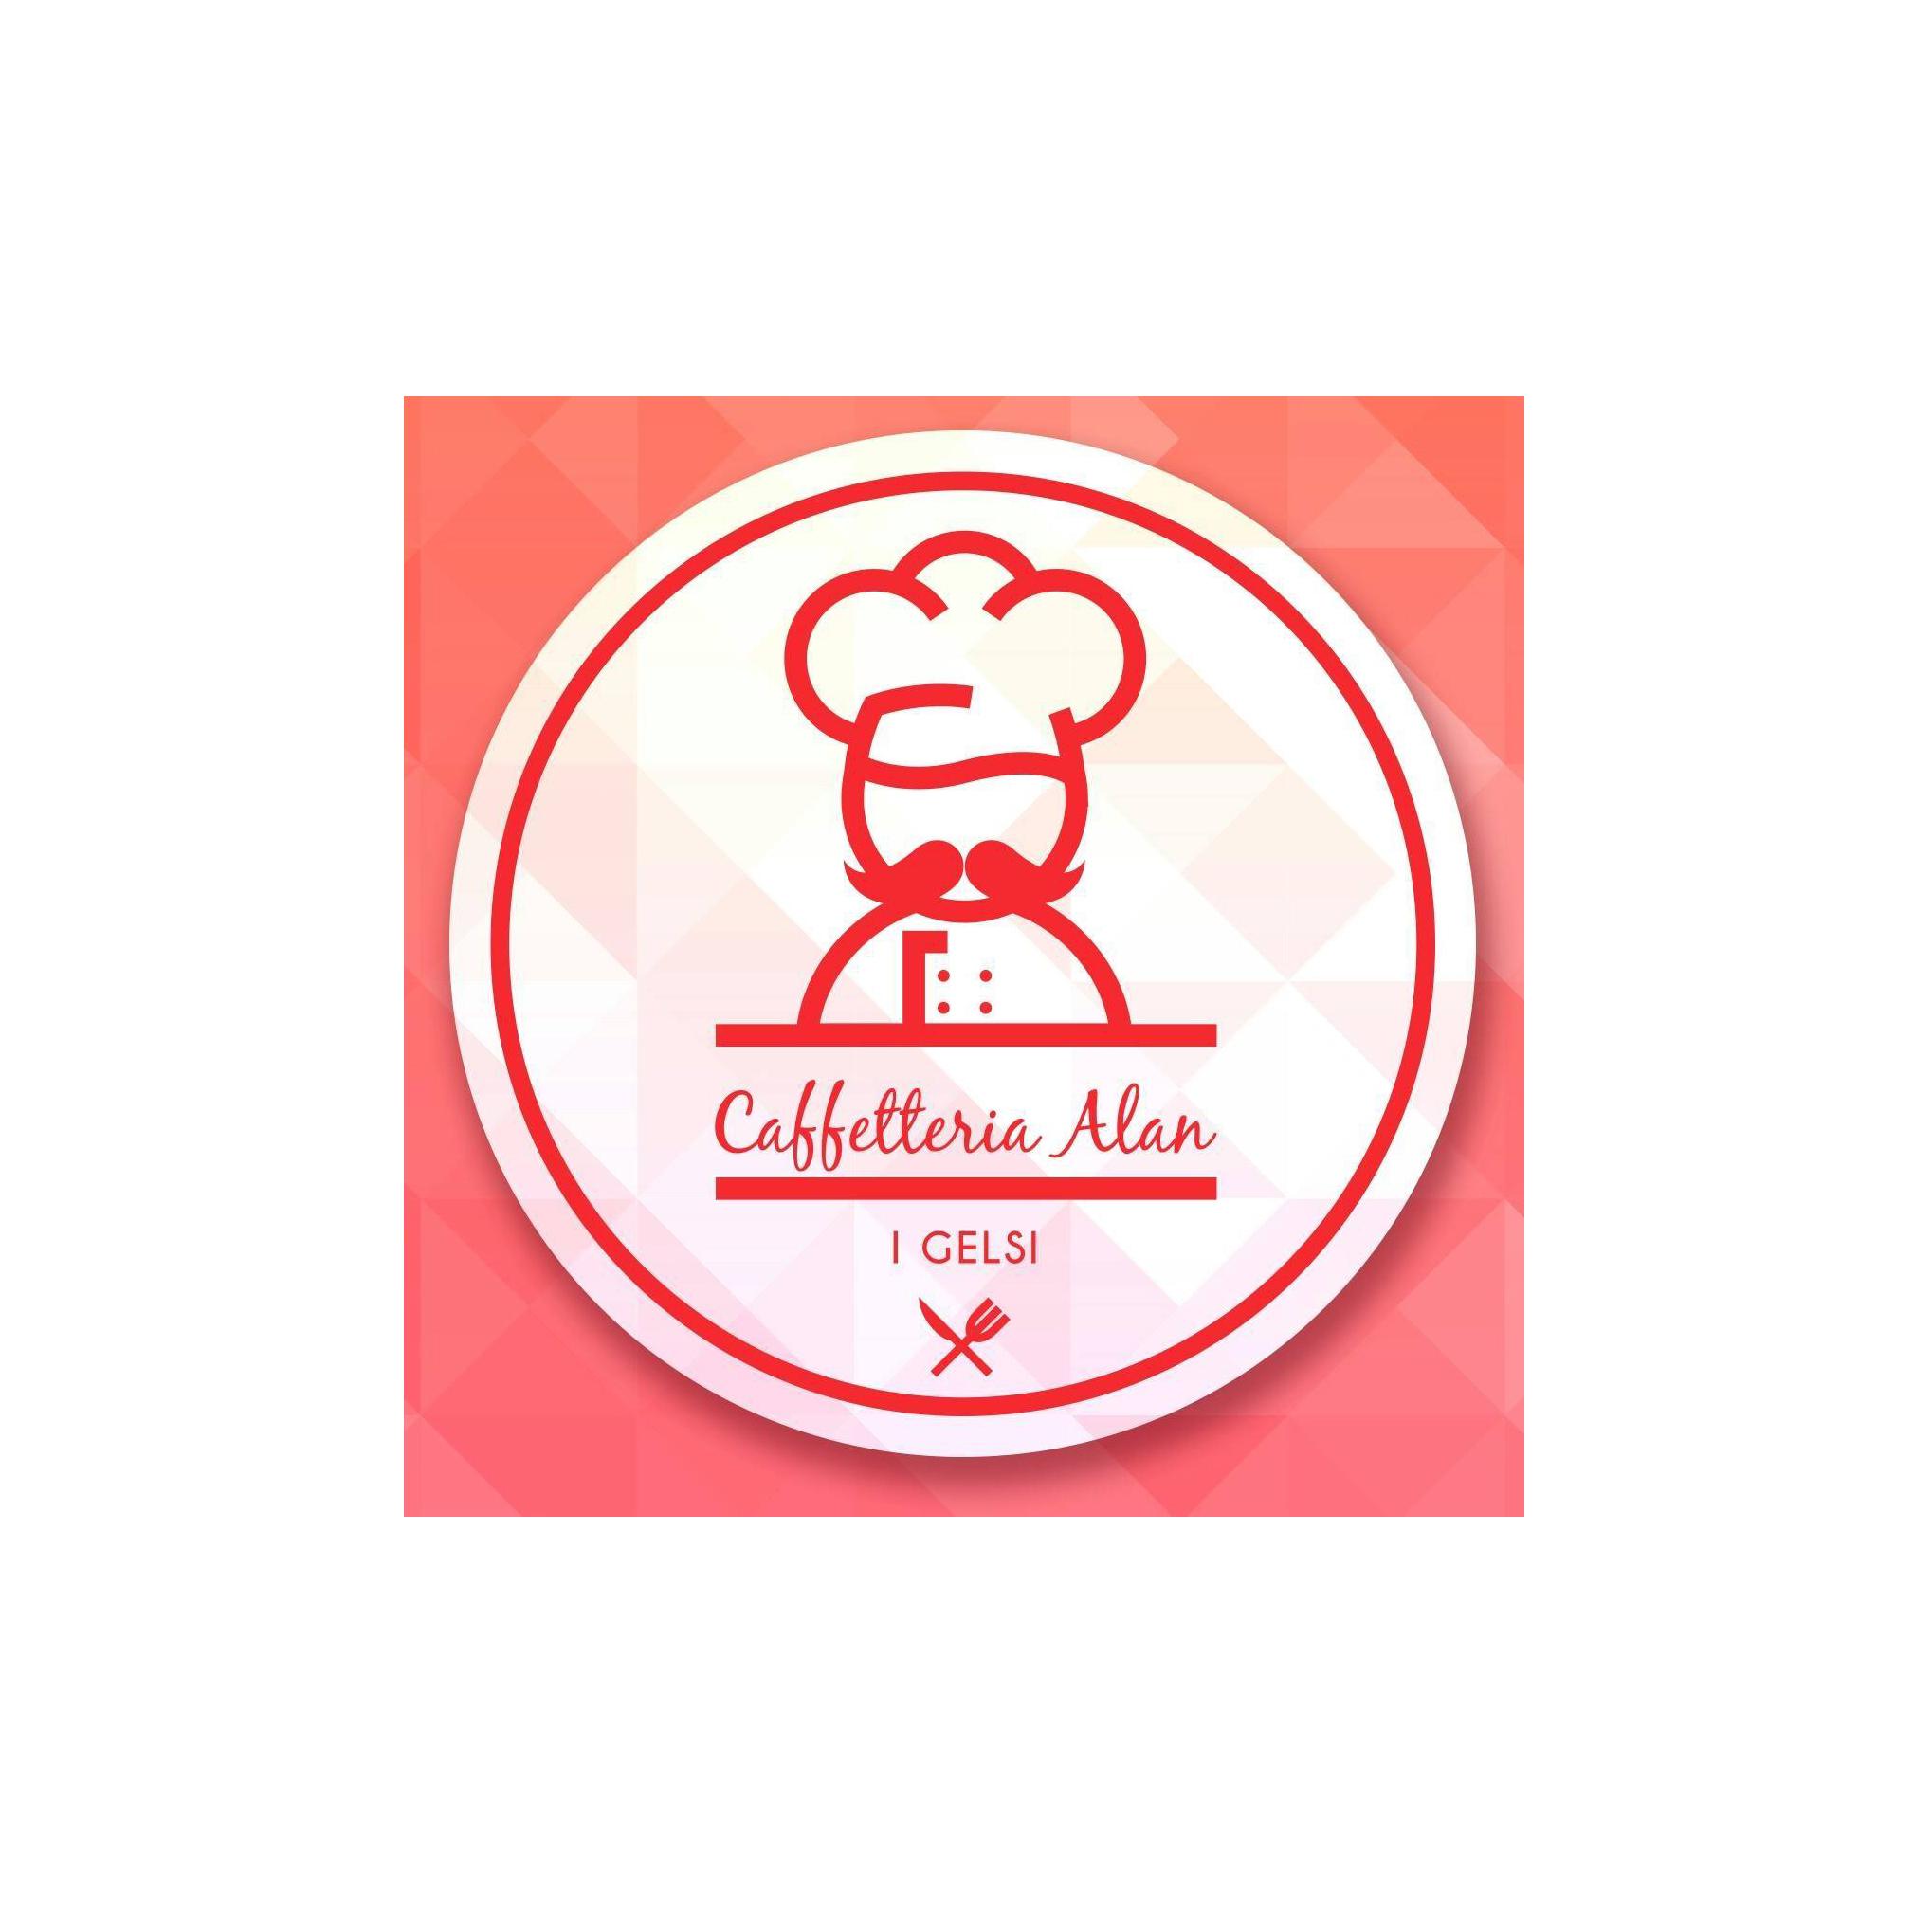 Caffetteria Alan